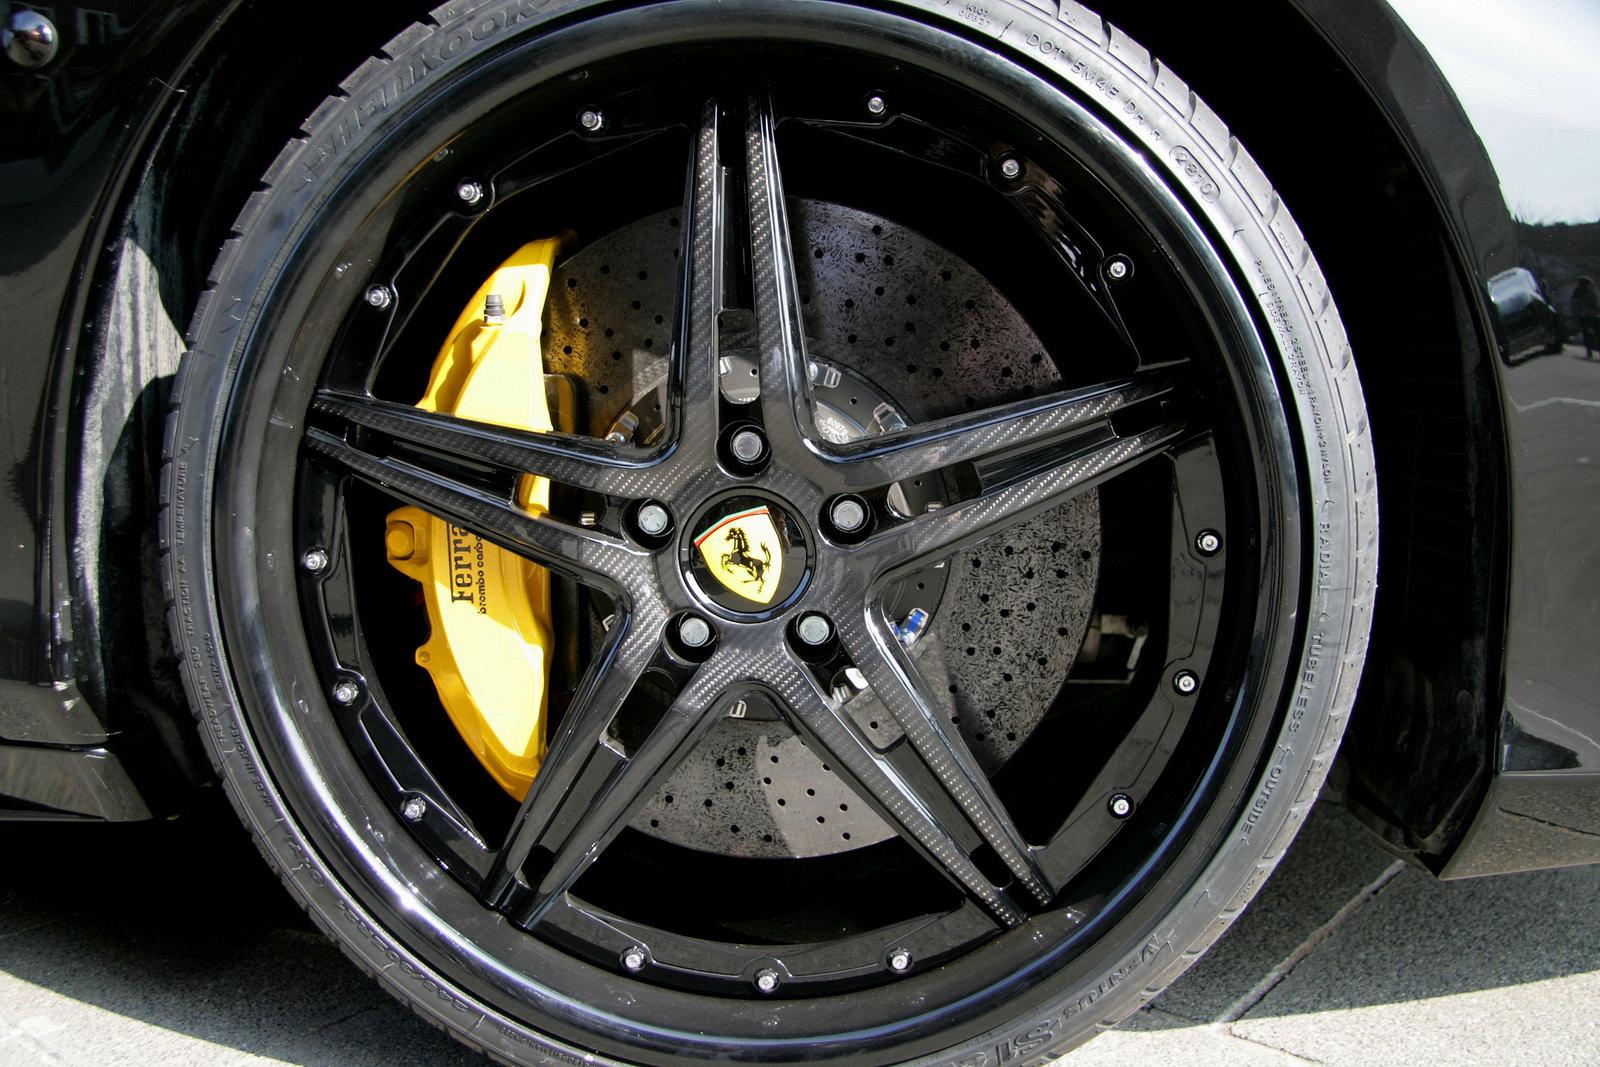 Ferrari 458 Black Carbon Edition Is Darth Vader's Supercar of Choice - autoevolution